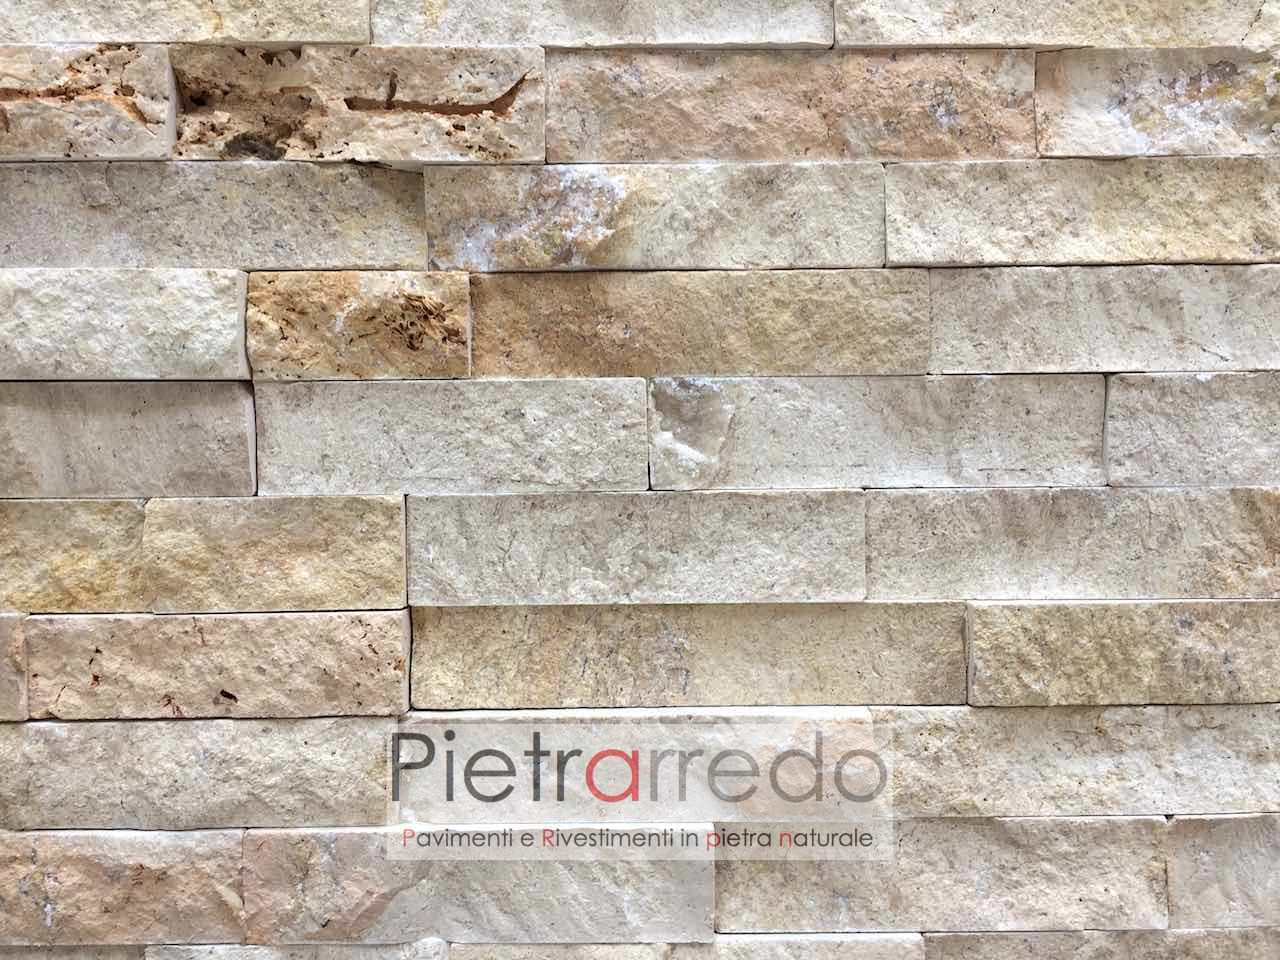 Rivestimento in pietra travertino 50 offerta 66 mq - Rivestimento per esterno in pietra ...